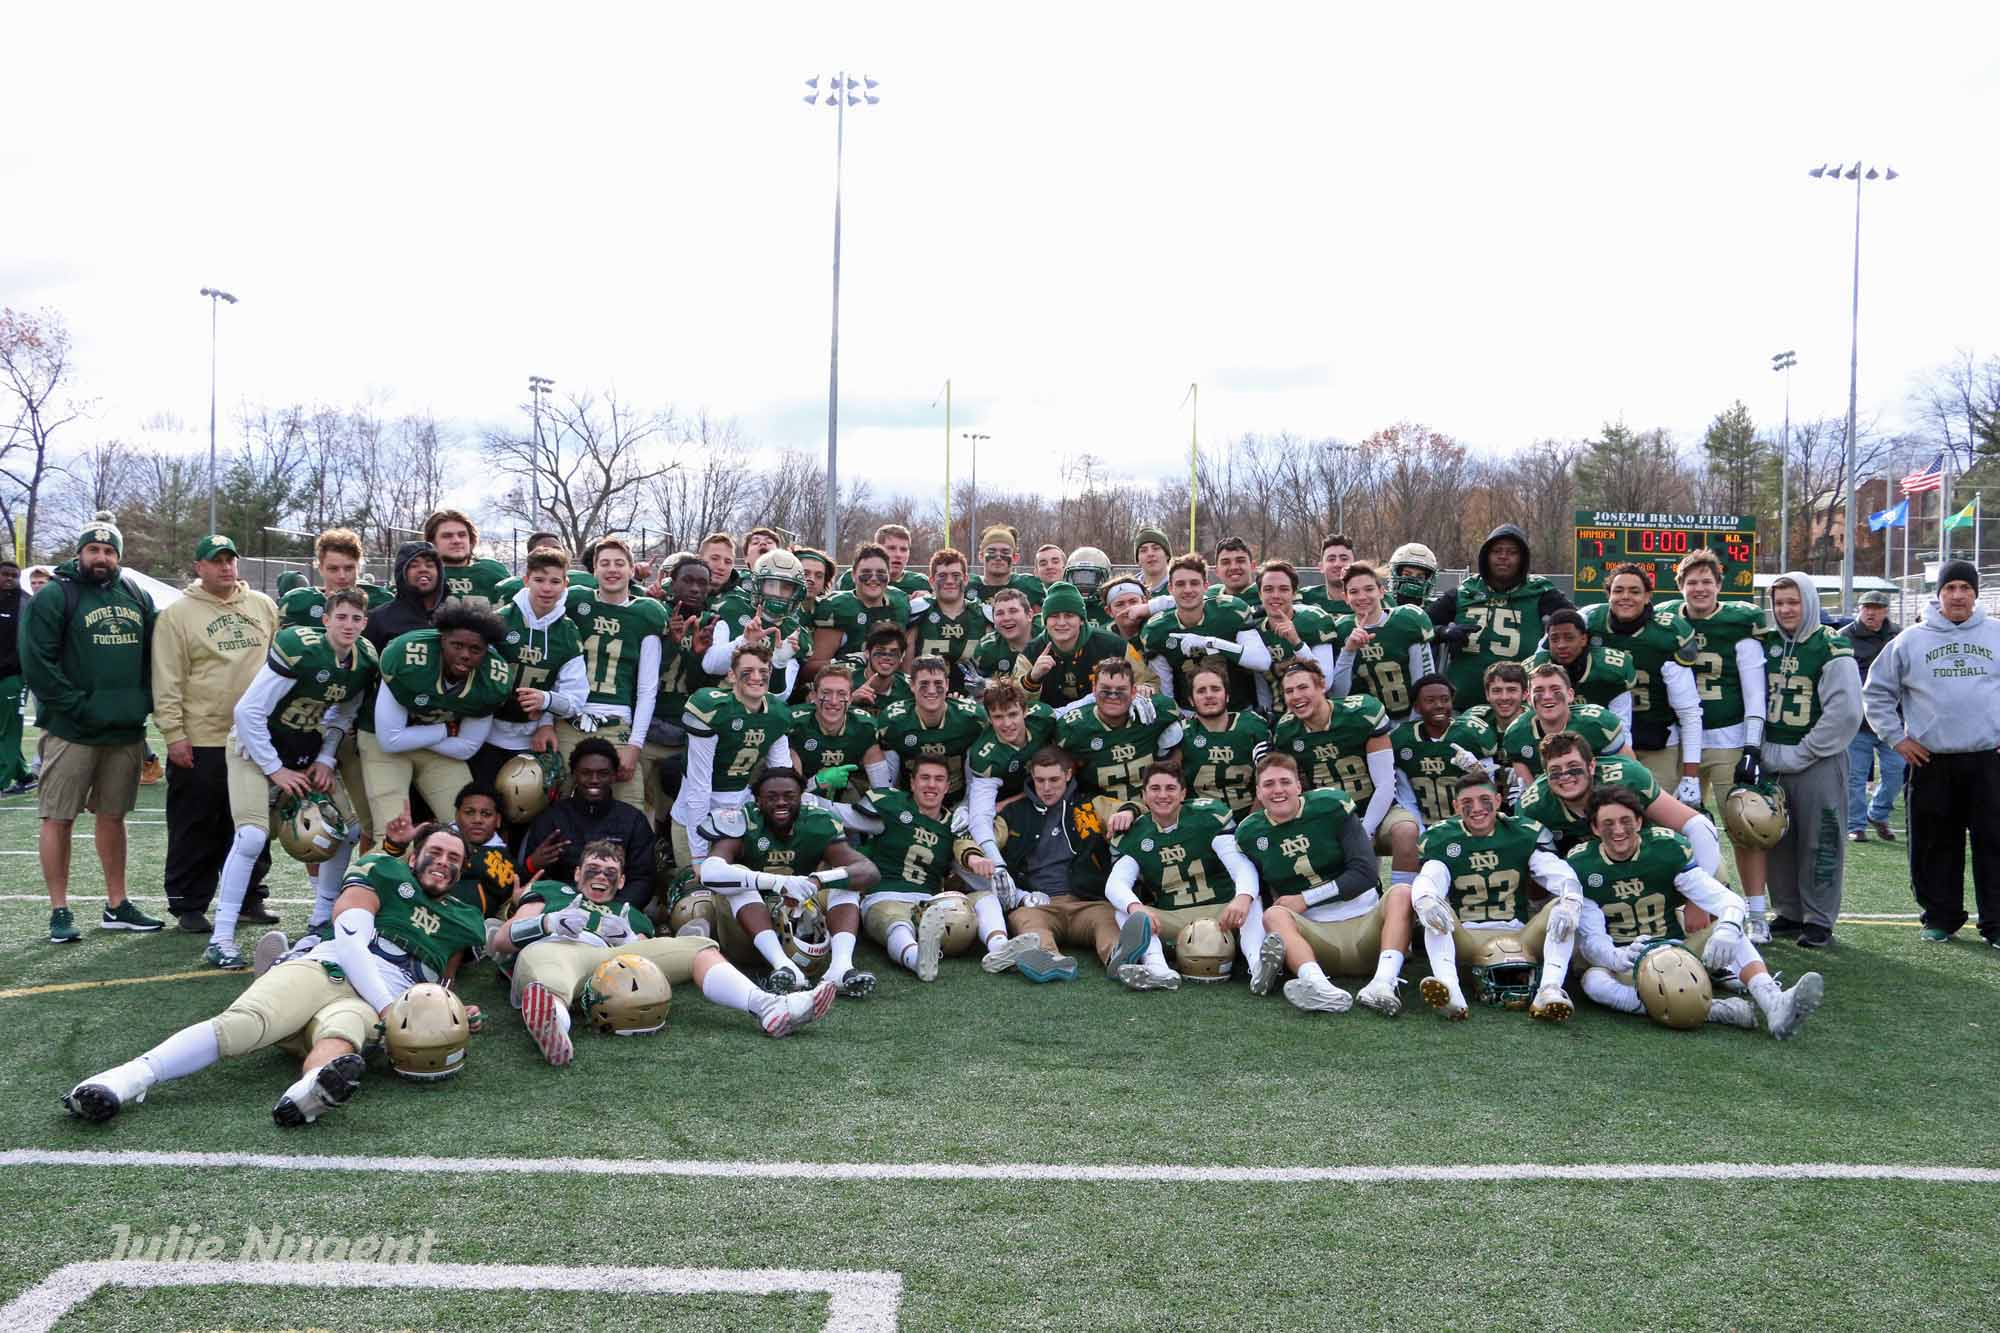 Knights take 69th Green Bowl